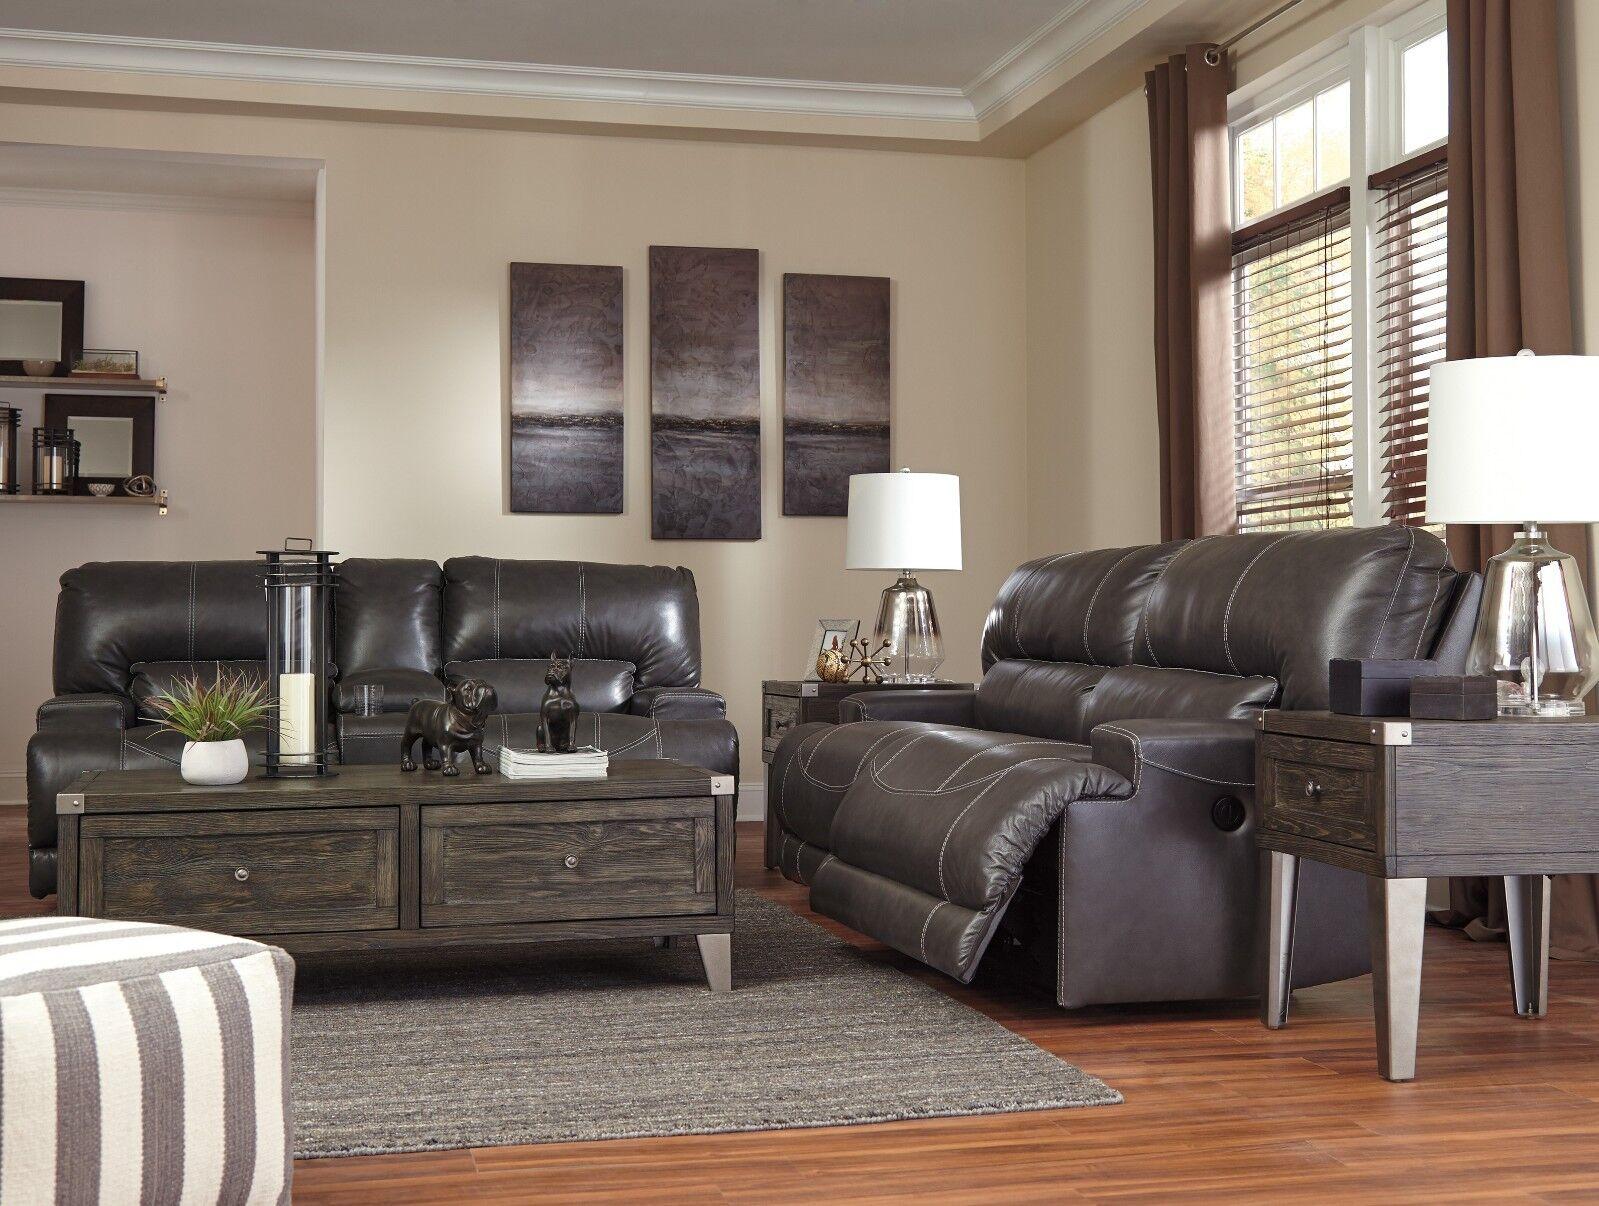 Ashley Furniture Lenoris Leather Reclining Sofa In Coffee For Sale Online Ebay